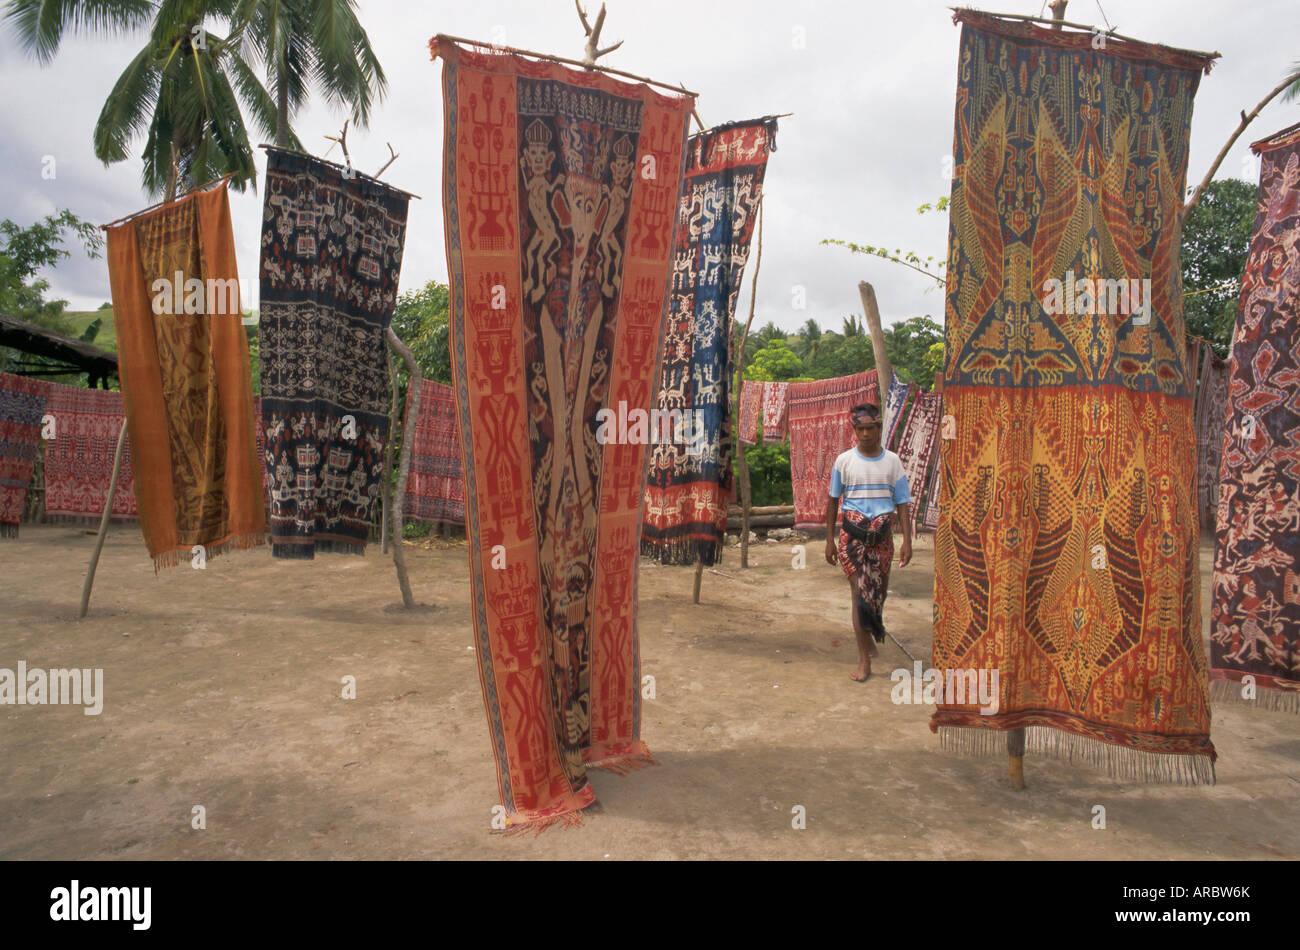 Ikat cloths for sale, Sumba (Soemba) , Lesser Sundas, Indonesia, Southeast Asia, Asia - Stock Image